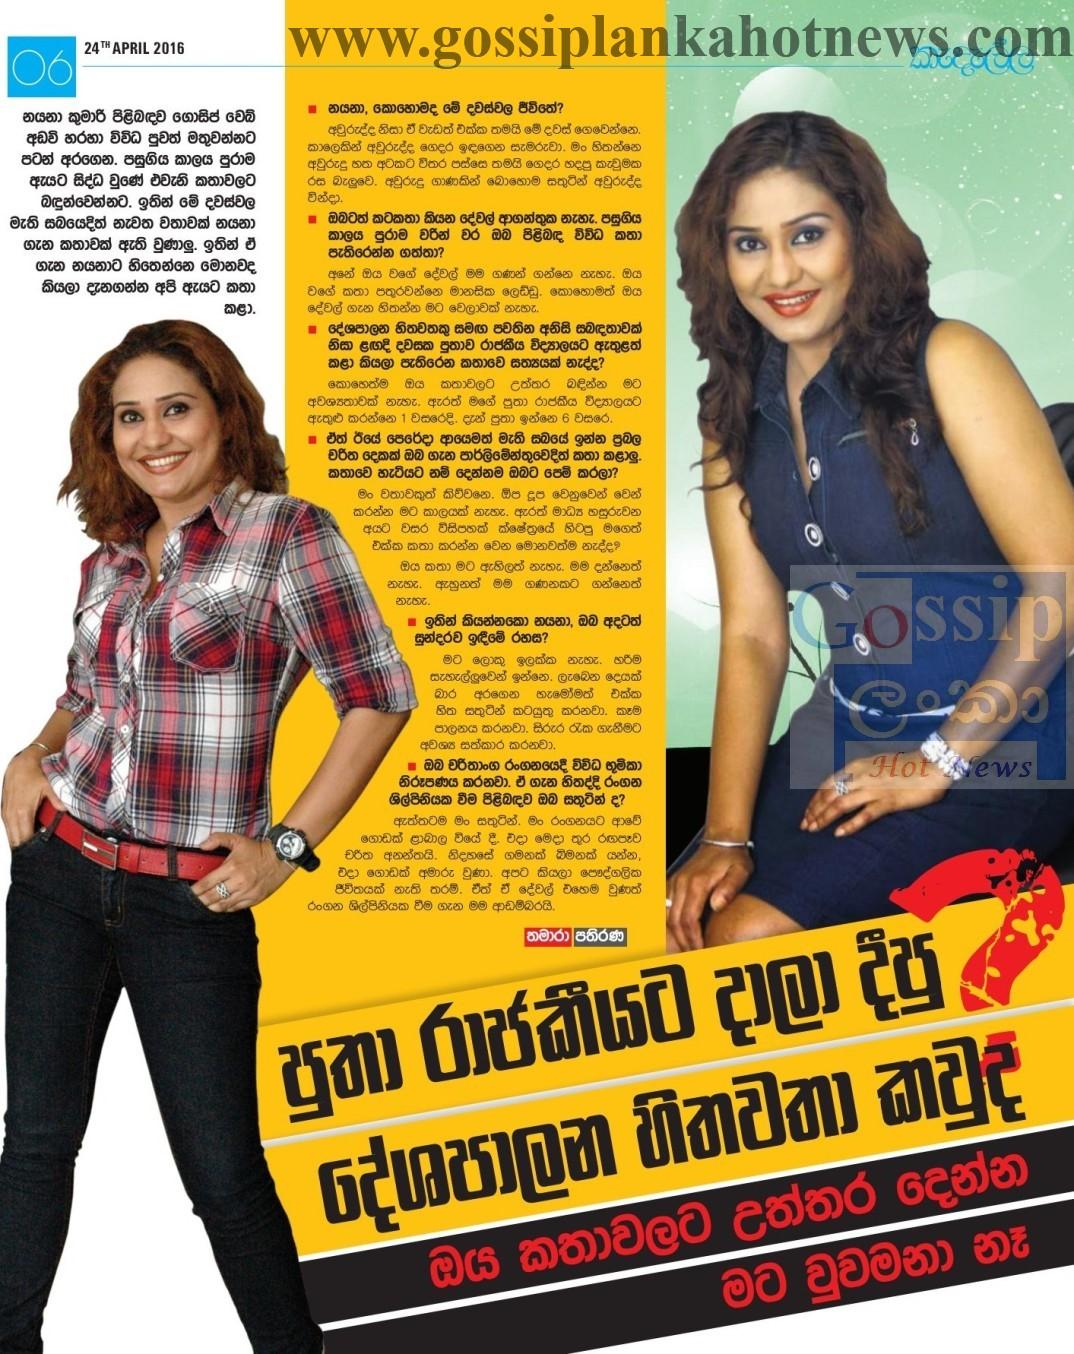 Nayana Kumari son royal college Gossip Lanka